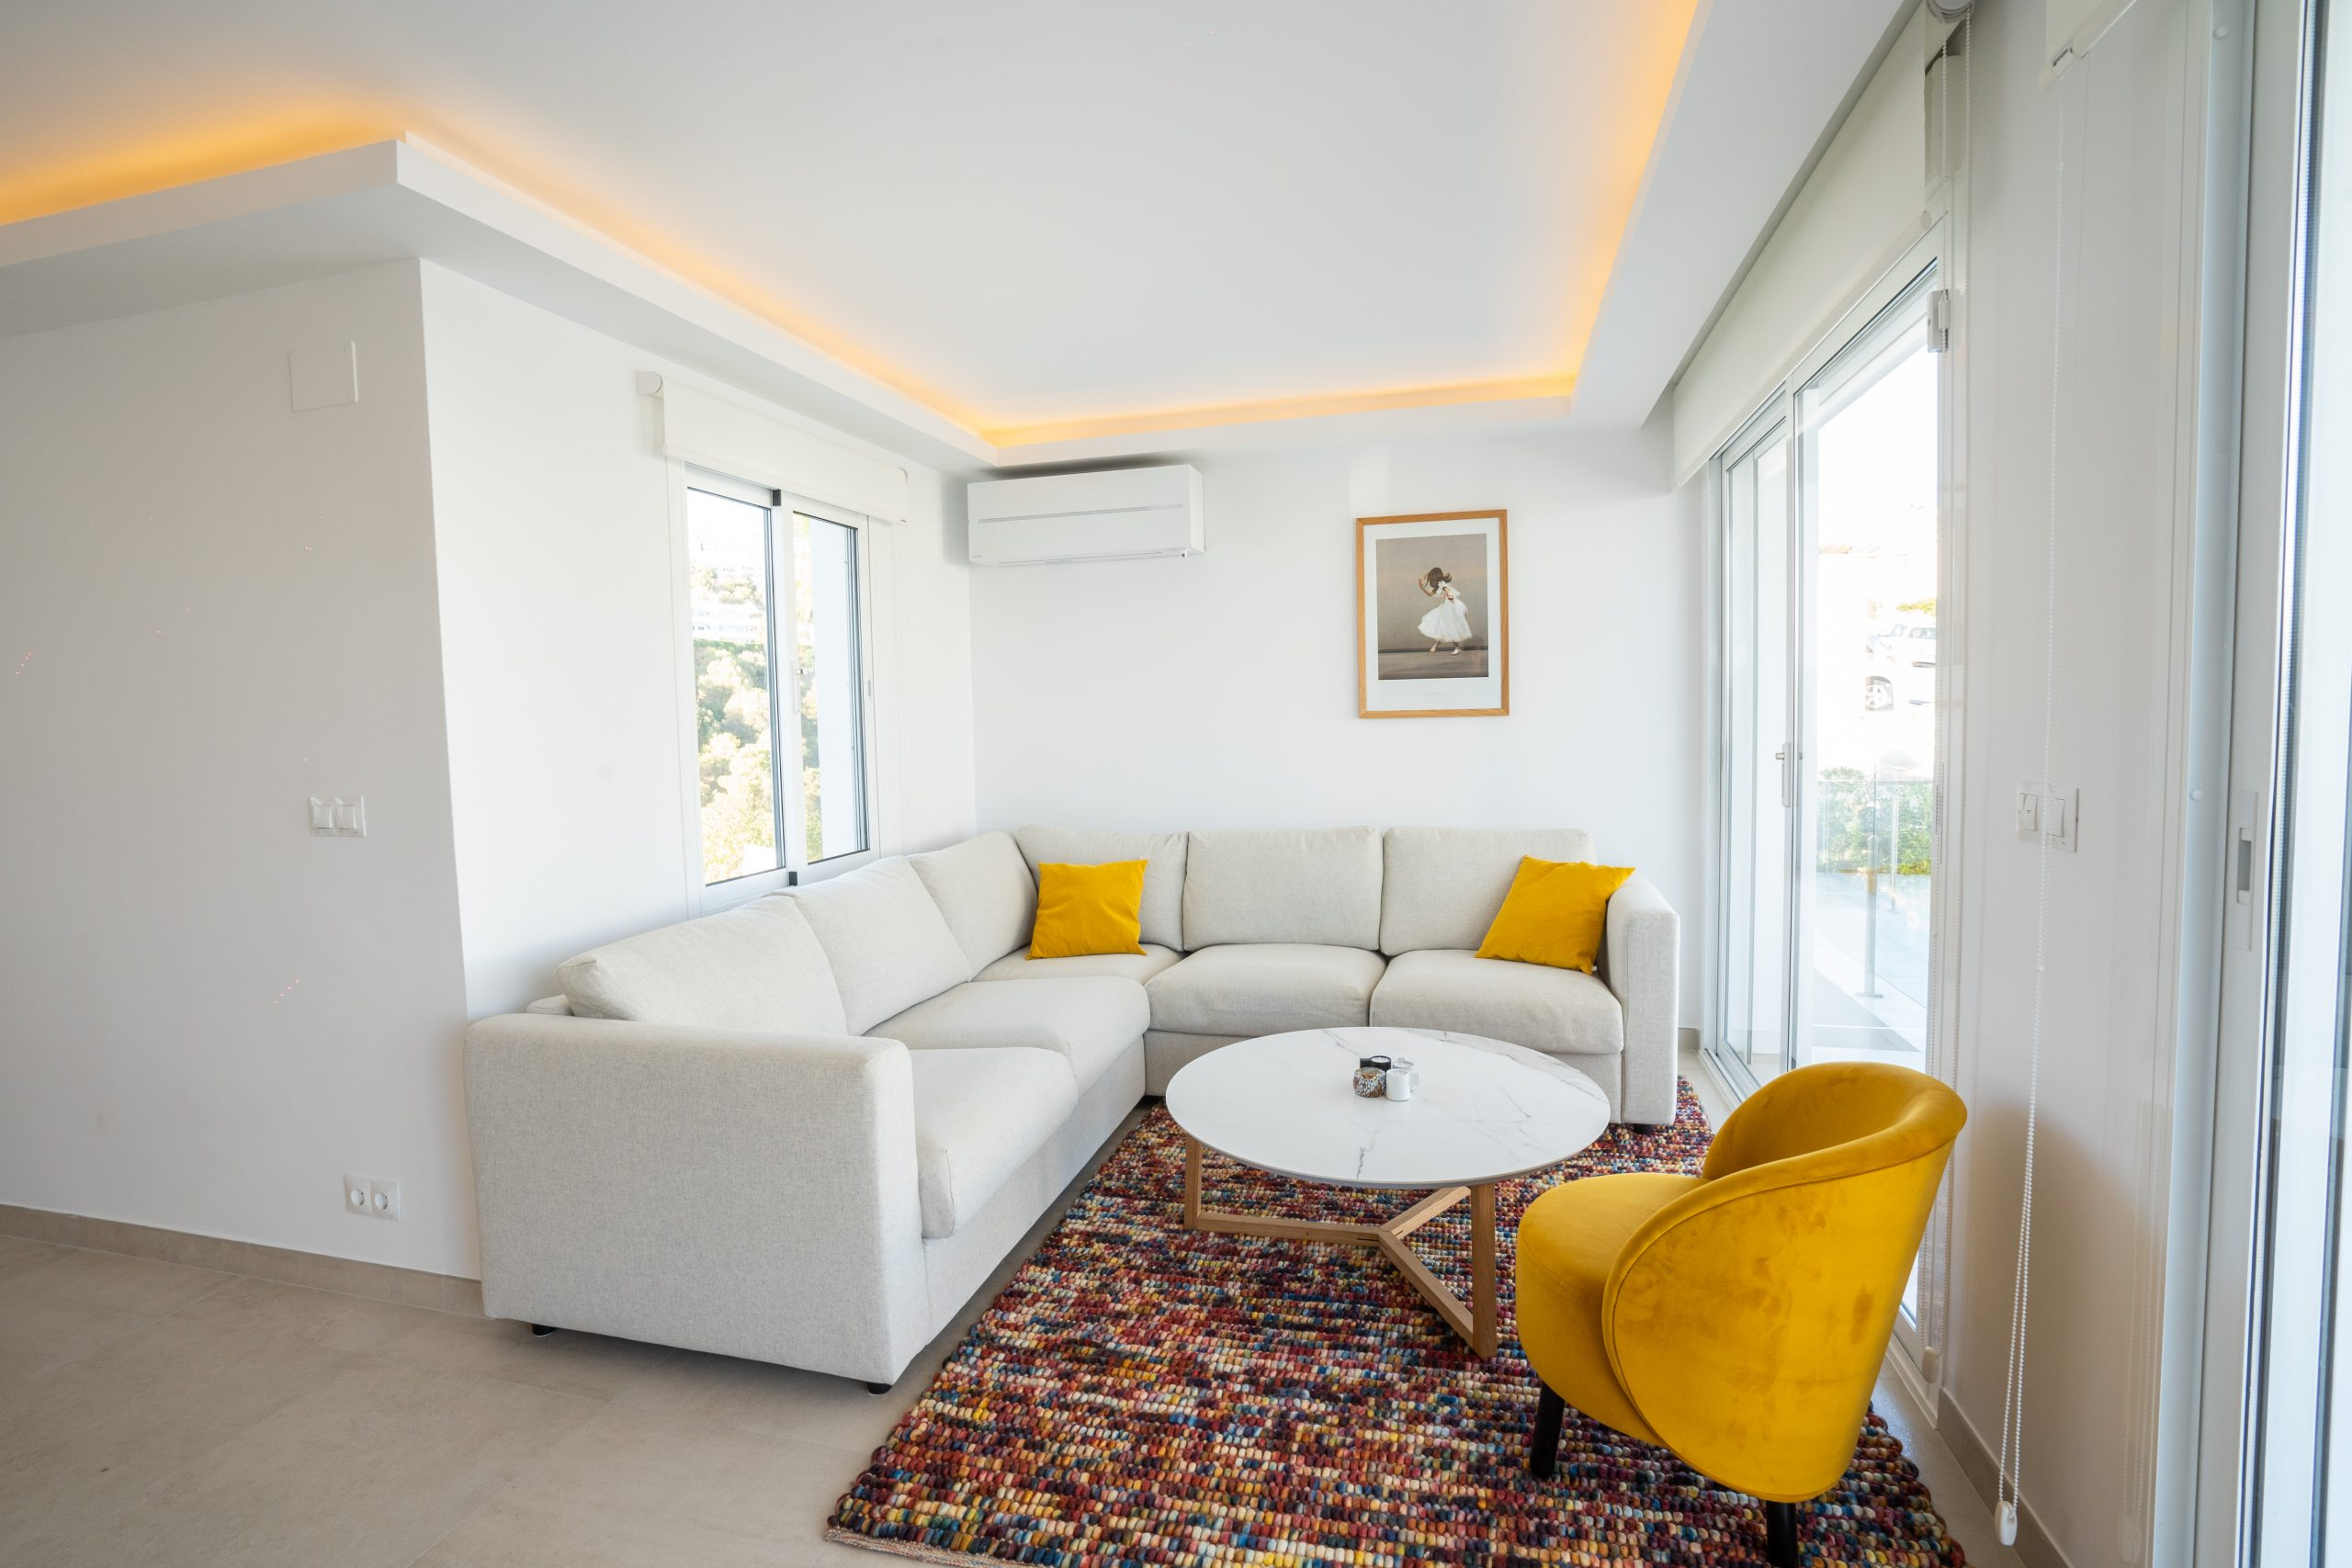 reforma salón villa con luminaria interior (4)